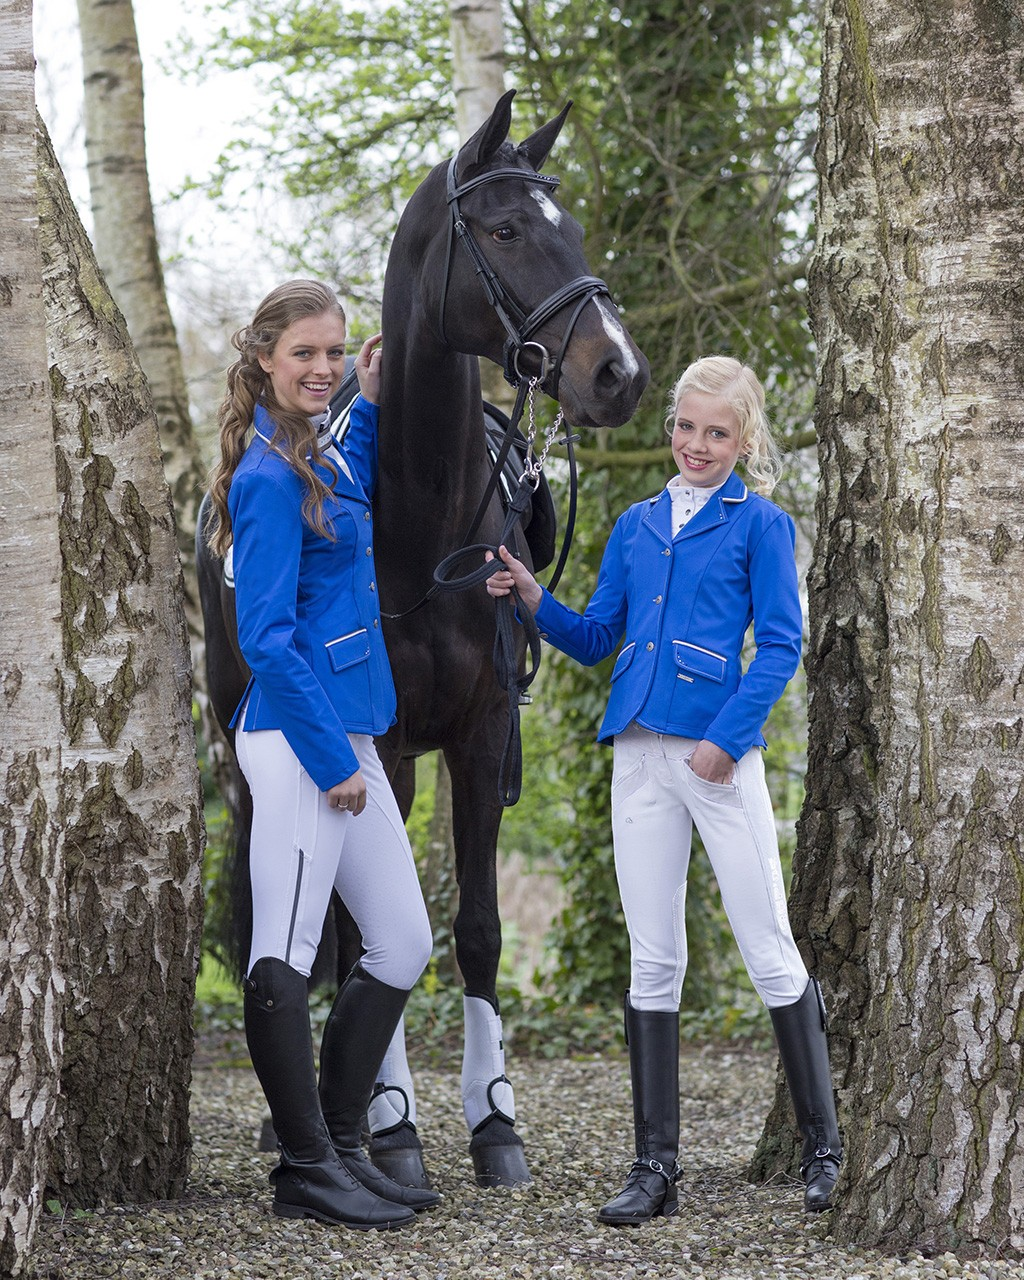 Qhp Coco Junior Competition Jacket Elite Equestrian